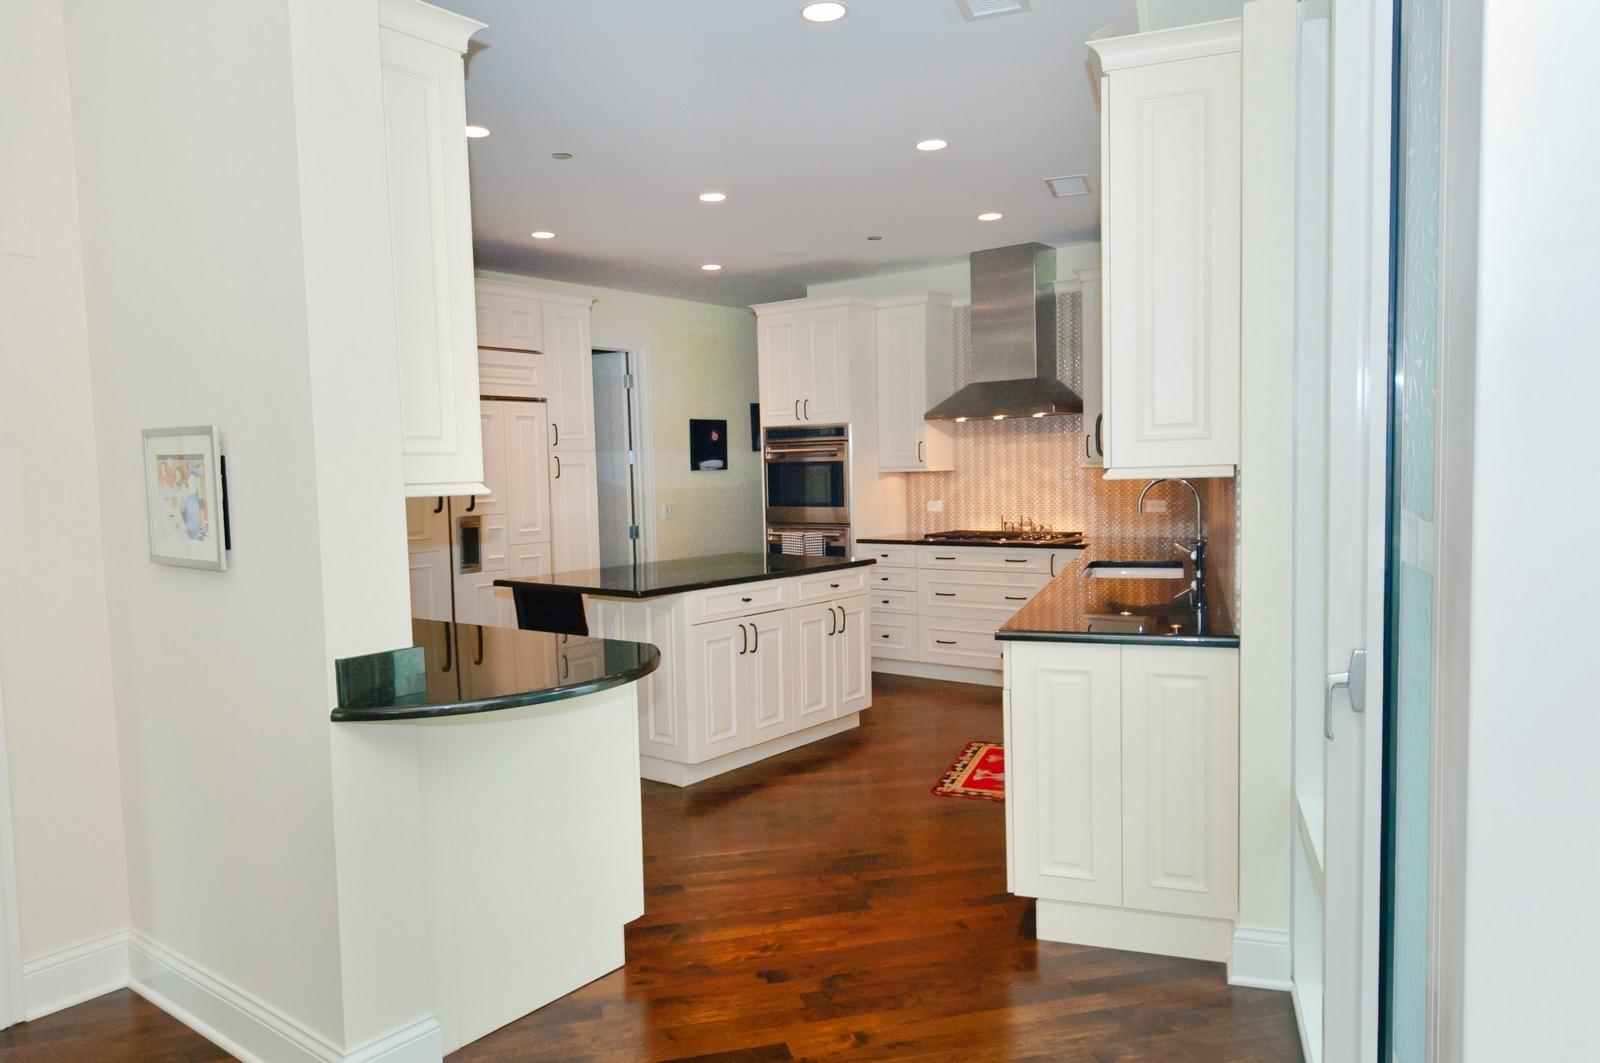 Real Estate Photography - 50 E. Chestnut, Apt 1001, Chicago, IL, 60611 - Kitchen 2